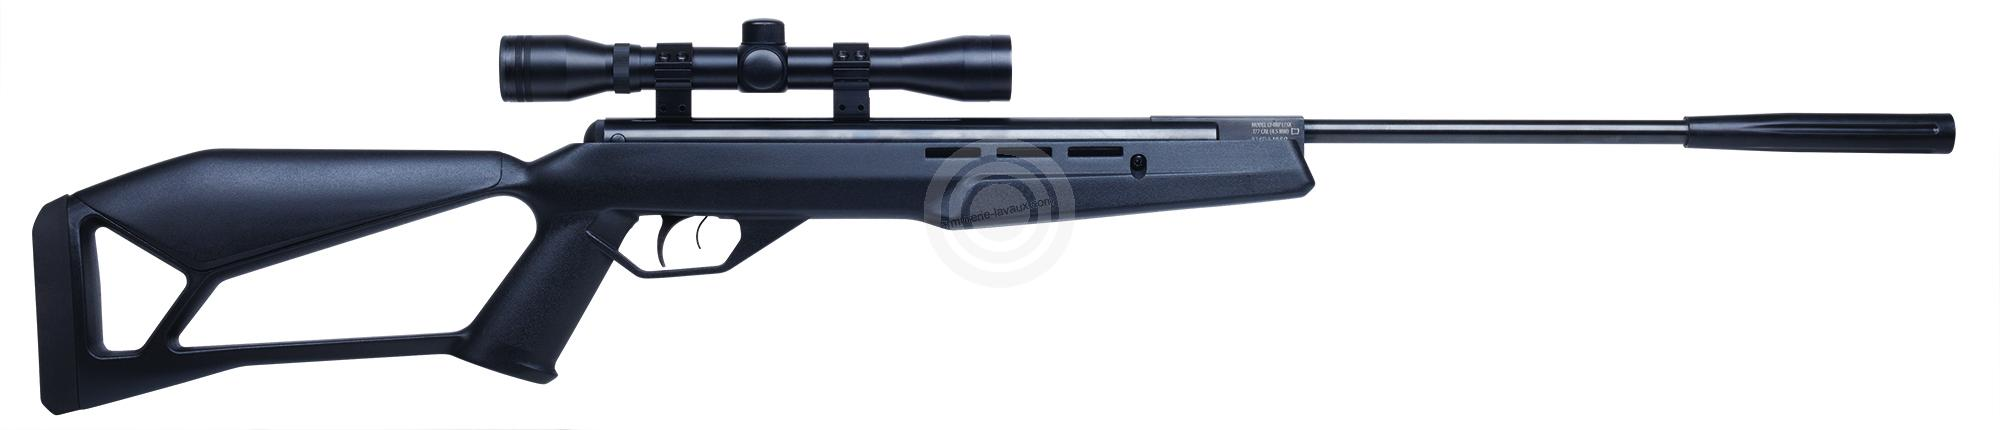 Carabine à plombs CROSMAN F4 Nitro piston cal.4,5mm